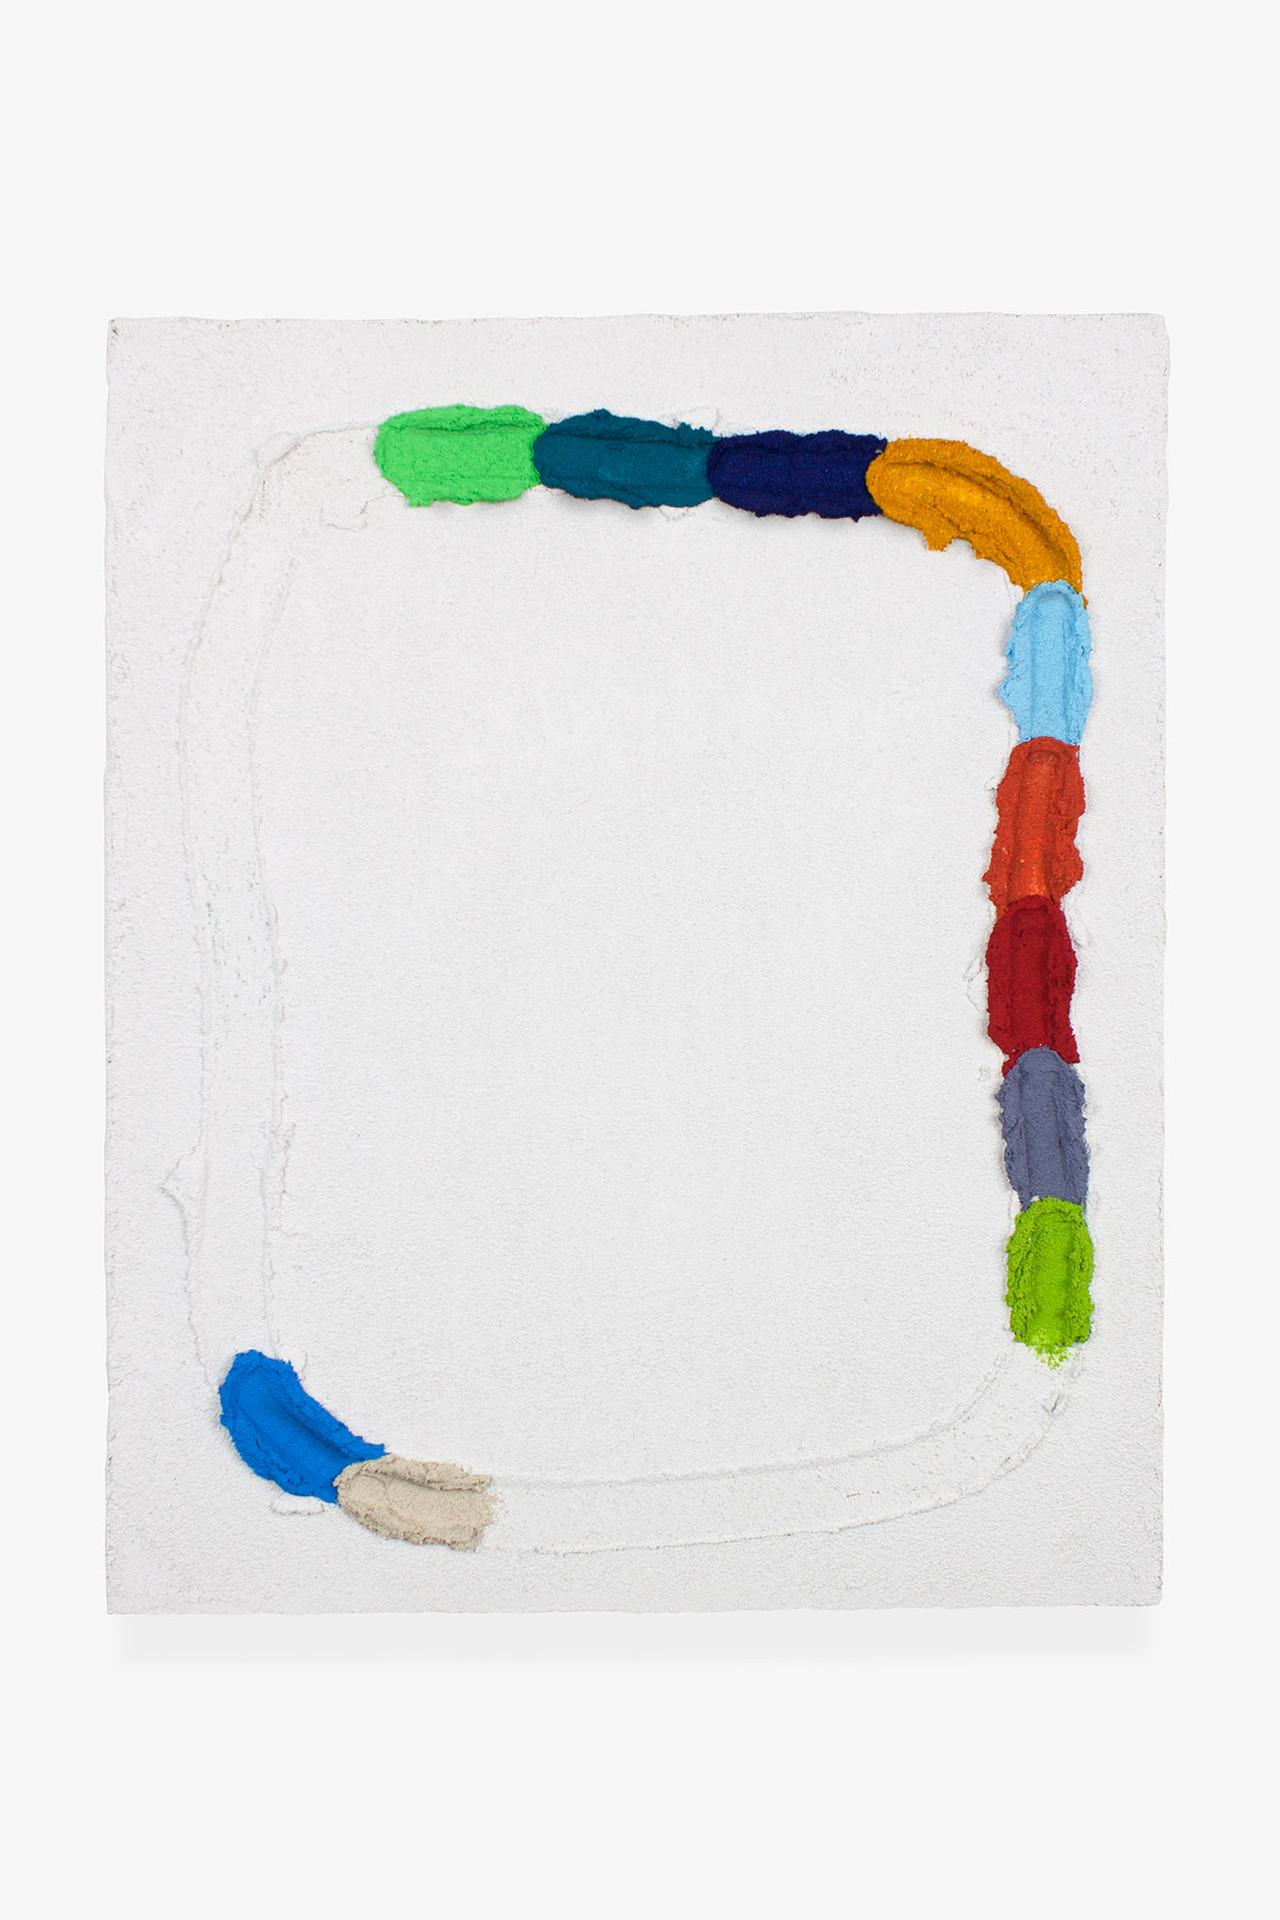 Pintura JL05, 2019. Acrylic, sand and limestone on canvas. 46 x 38 cm.